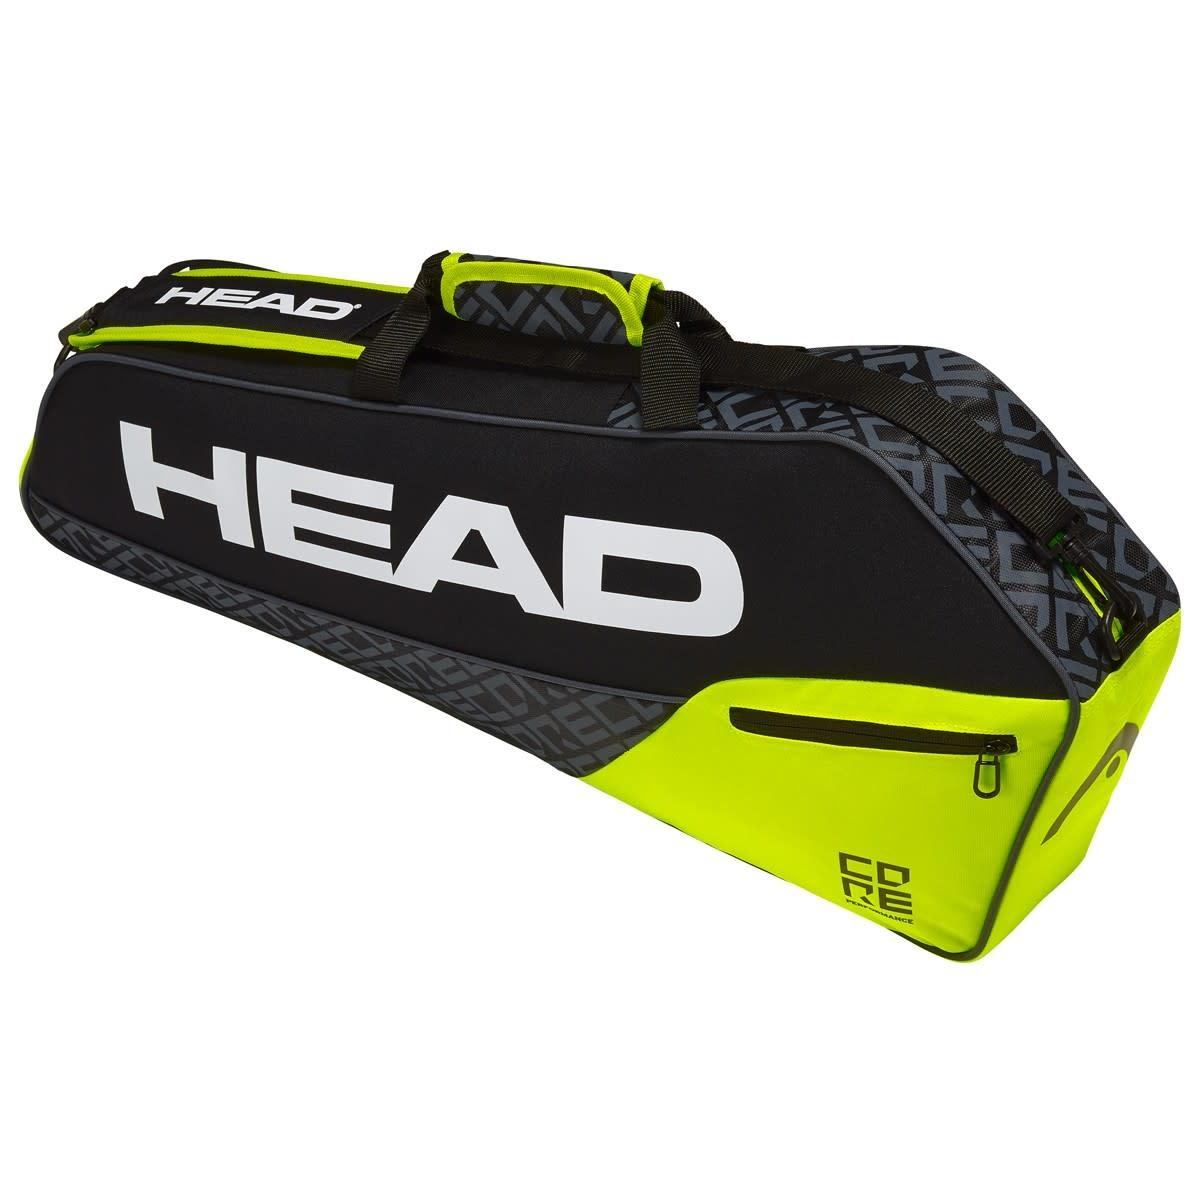 Head Core 3R Pro BKNY